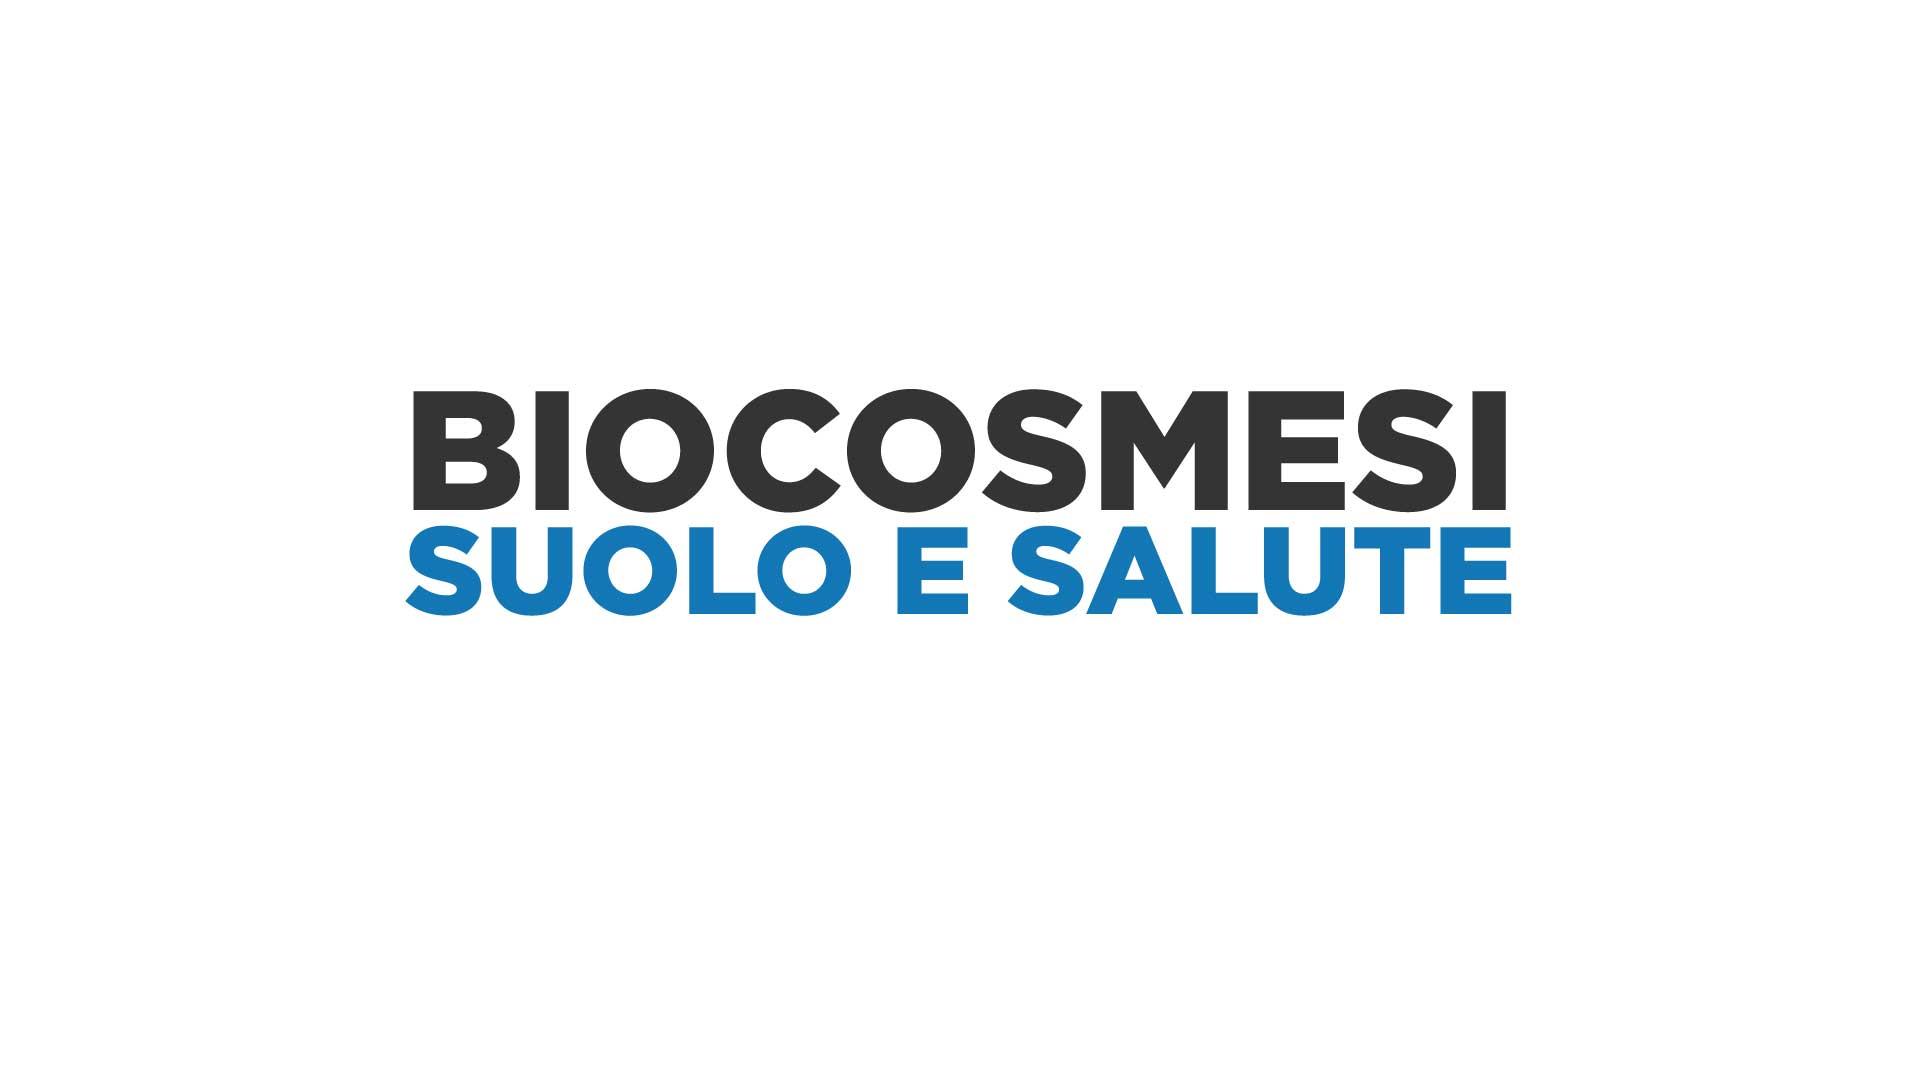 BIOCOSMESI SUOLO E SALUTE